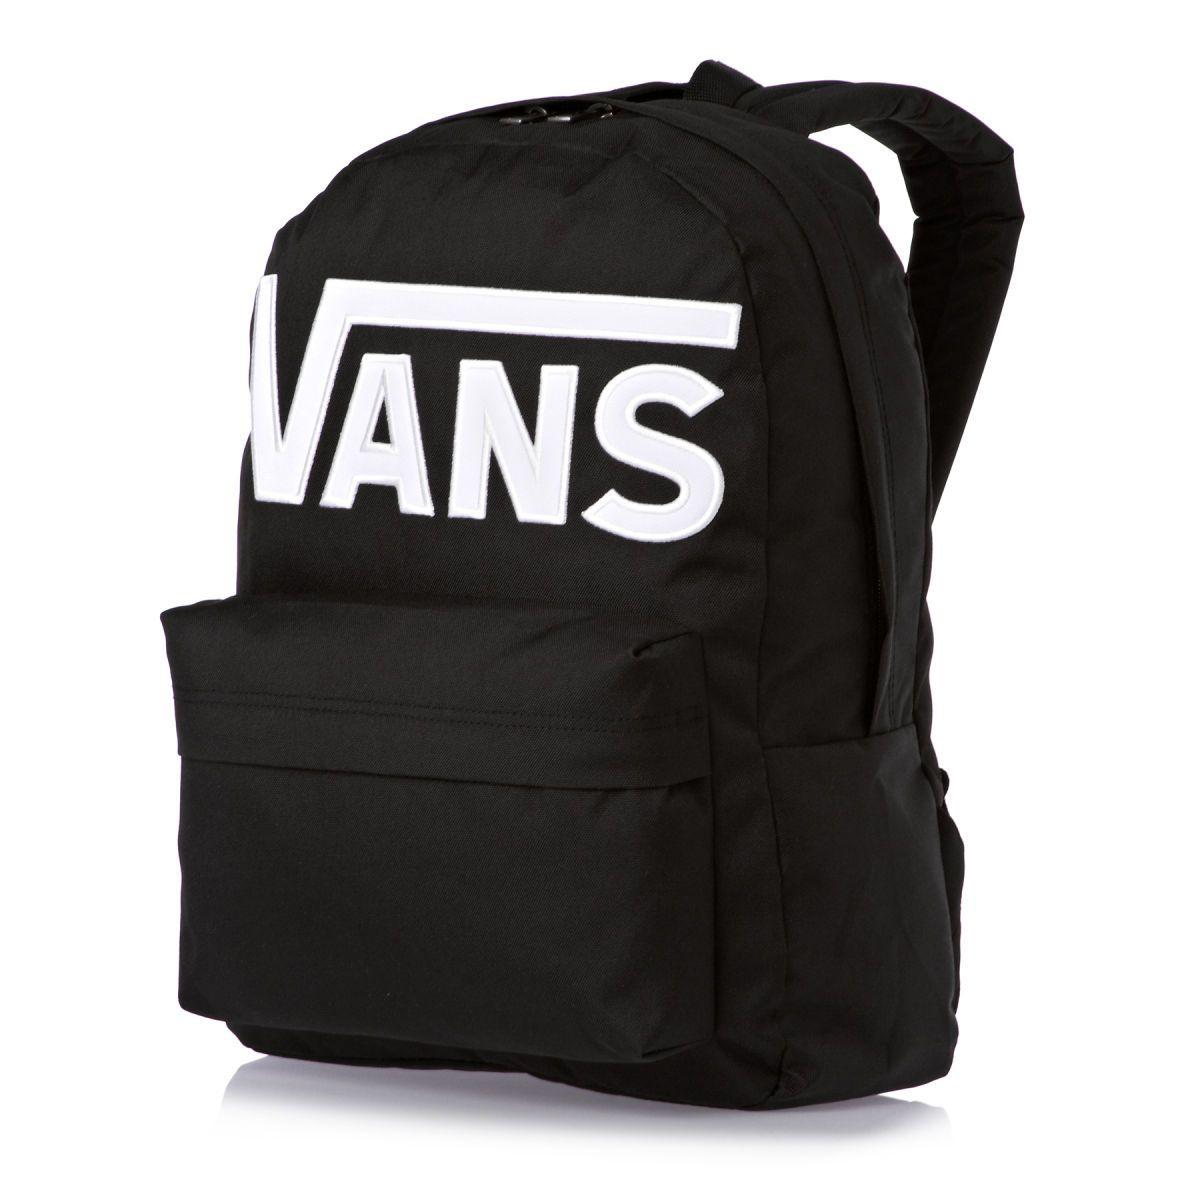 5d2a2a367b17 Vans Old Skool II Backpack - Black White